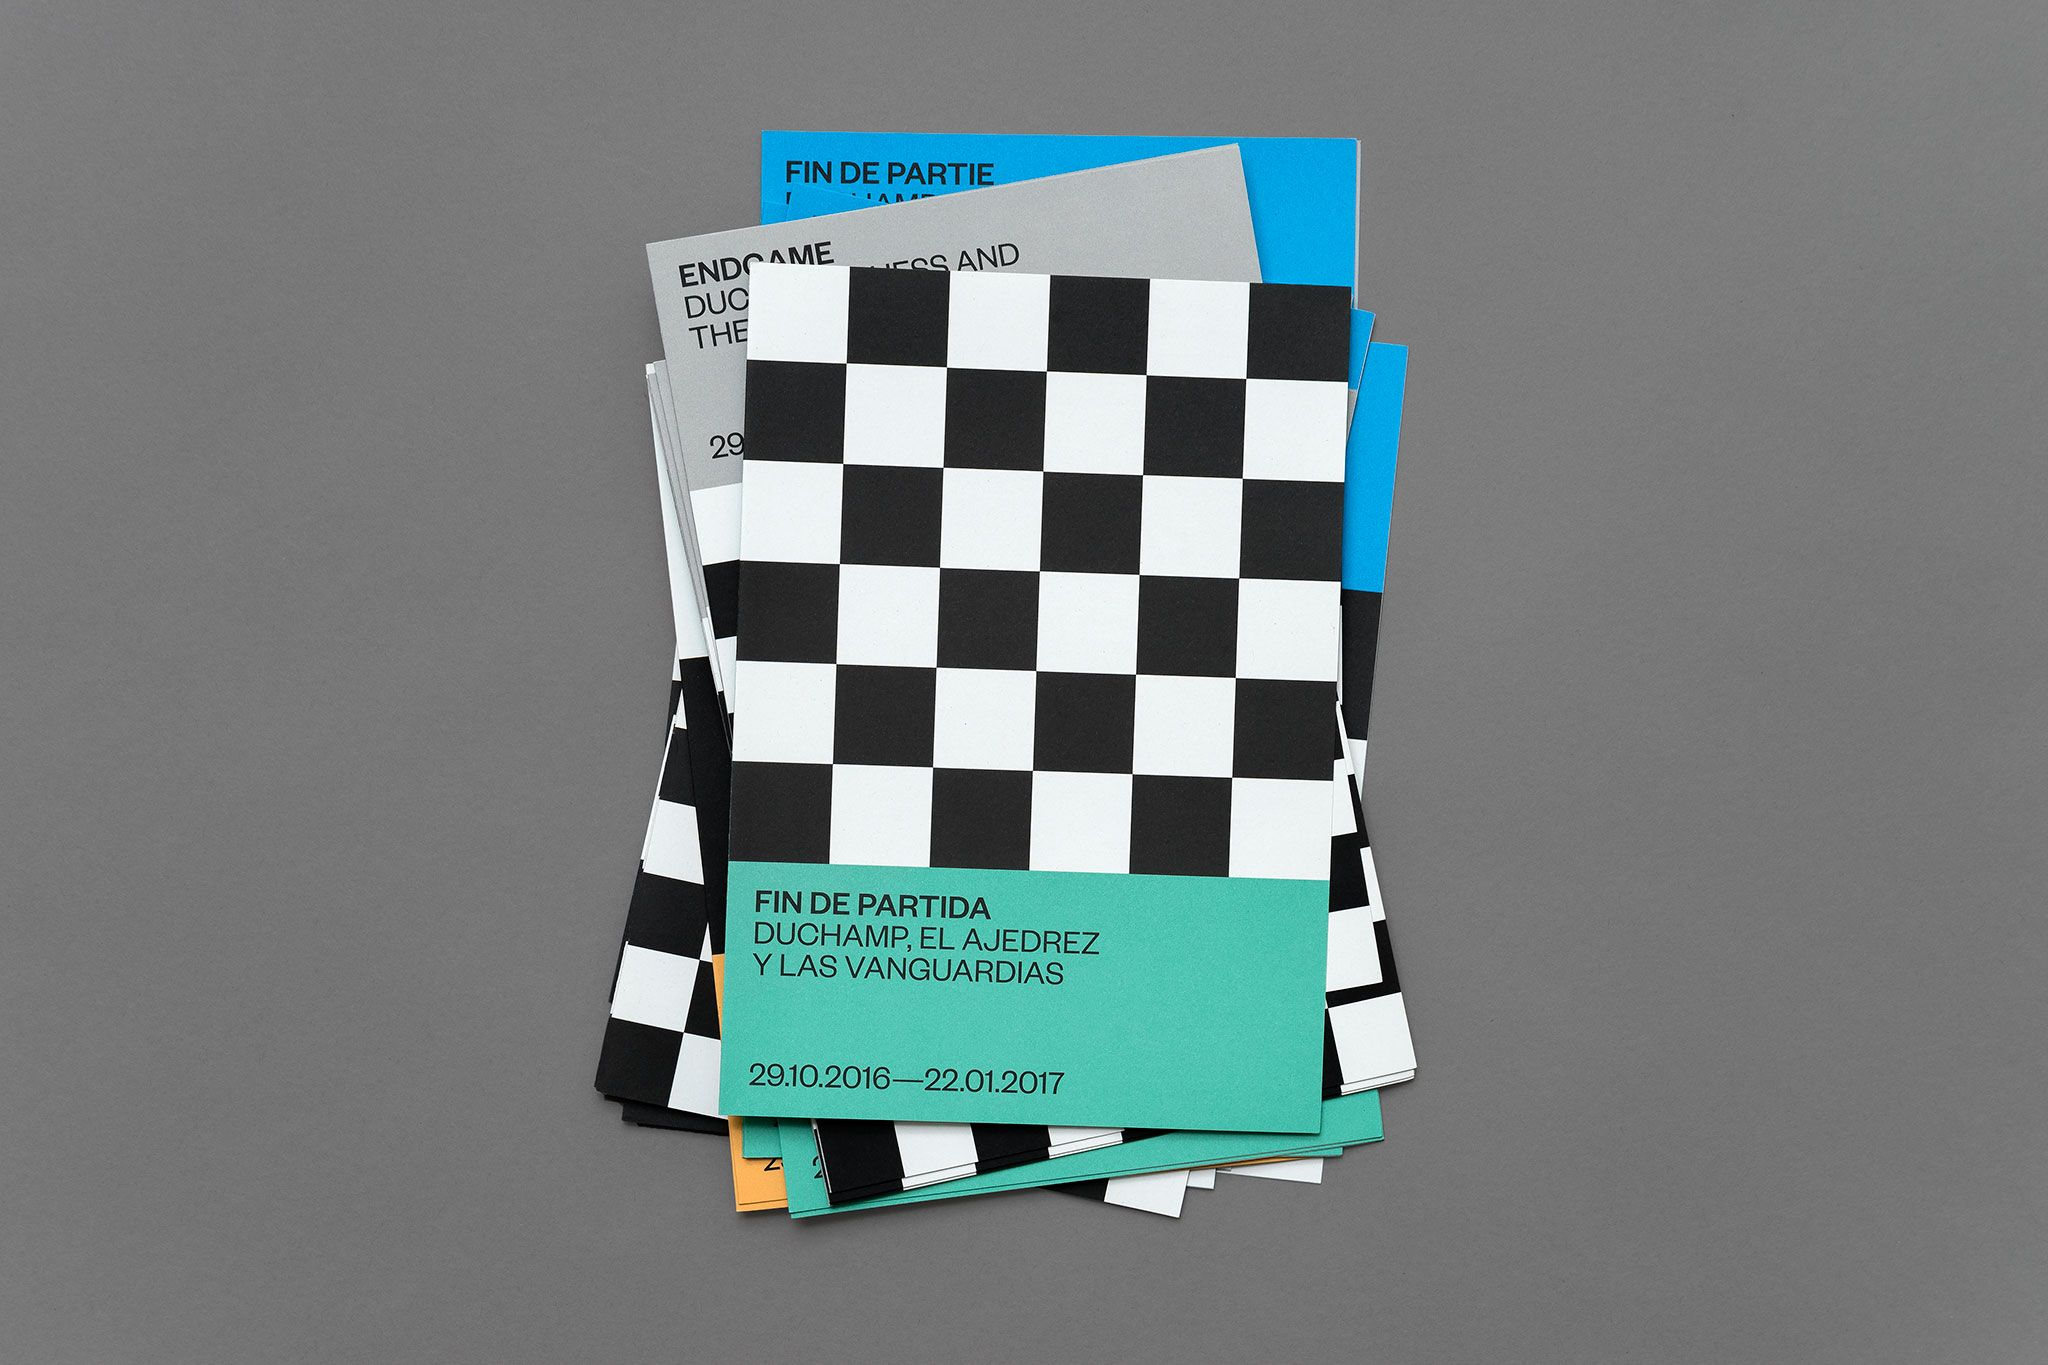 Fi De Partida Hey Book Design Chess Joan Miro